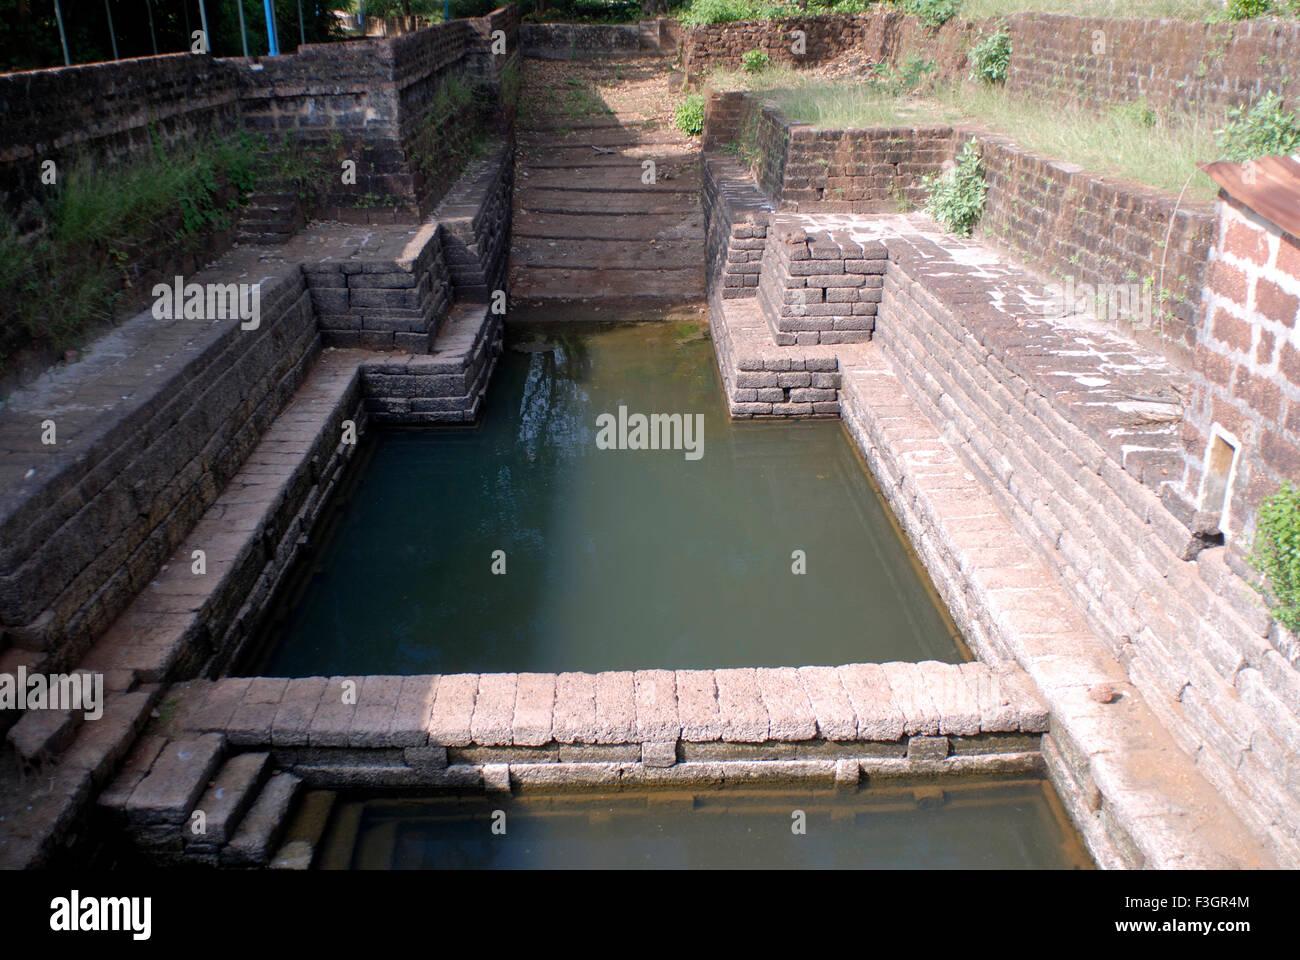 Old well water storing system in Ganpatipule ; District Ratnagiri ; Maharashtra ; India - Stock Image